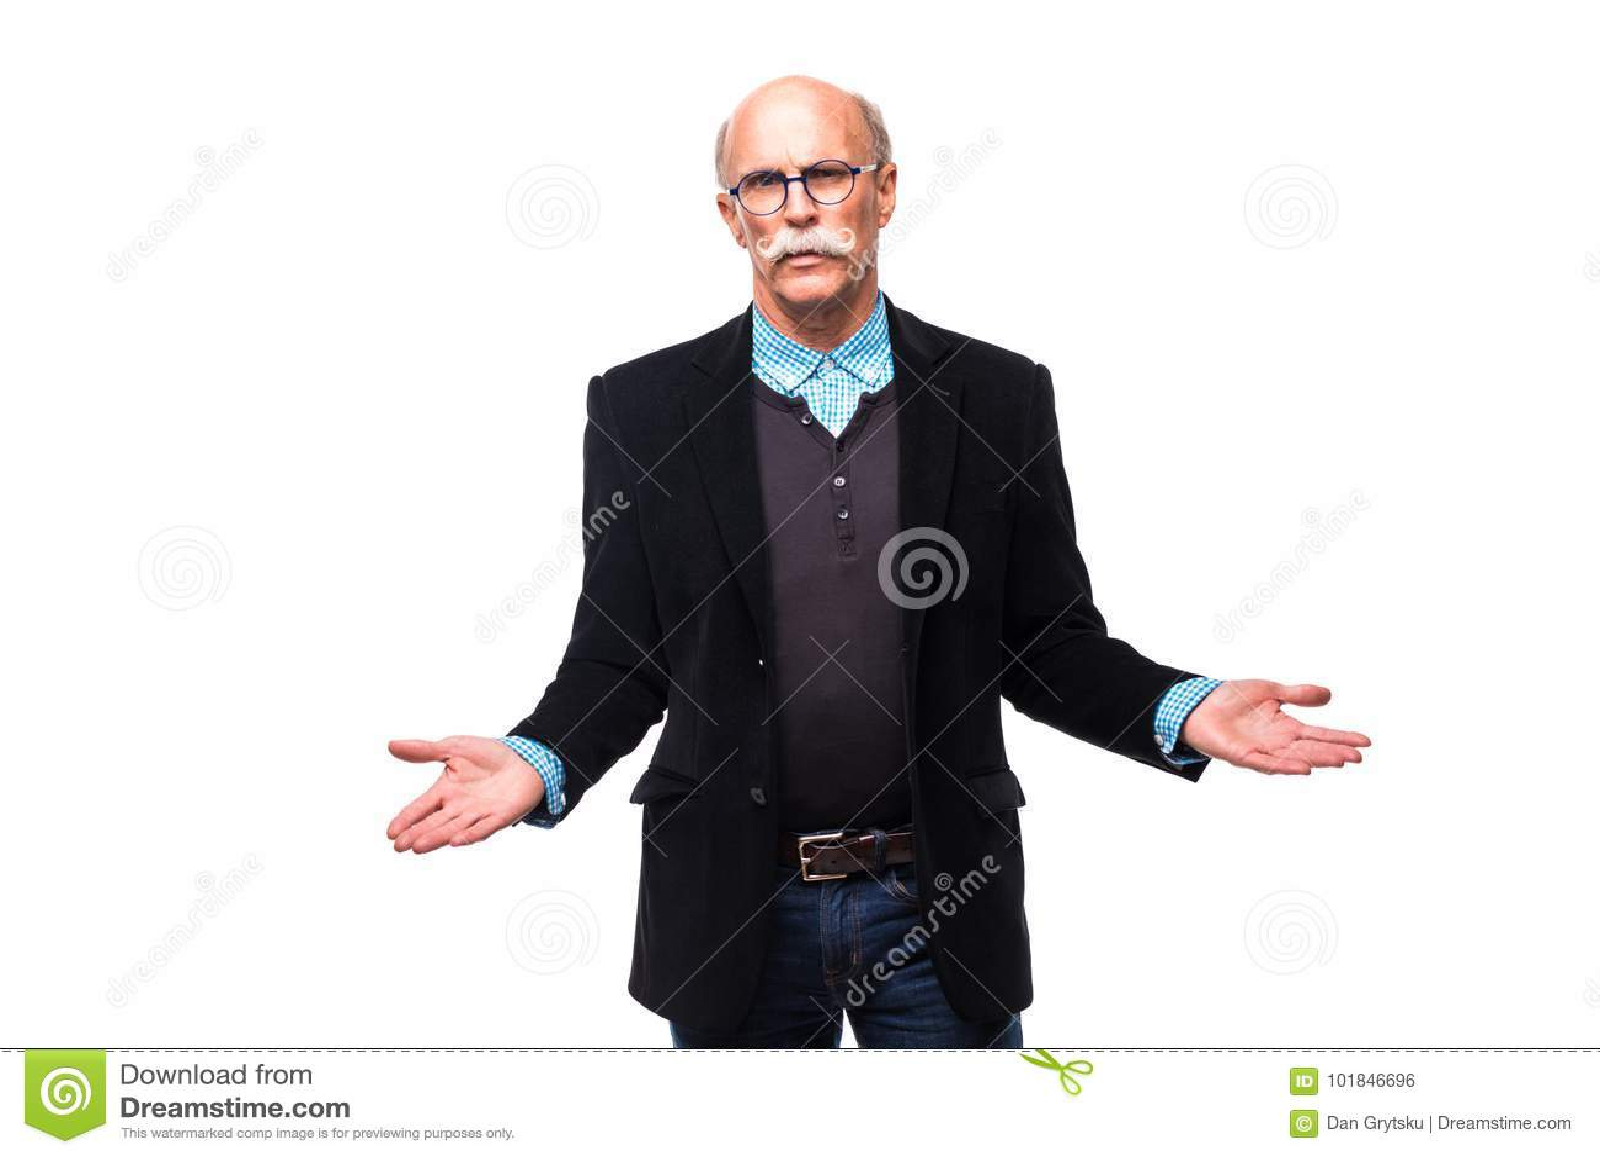 Senior man shrugging with raised hands on white background